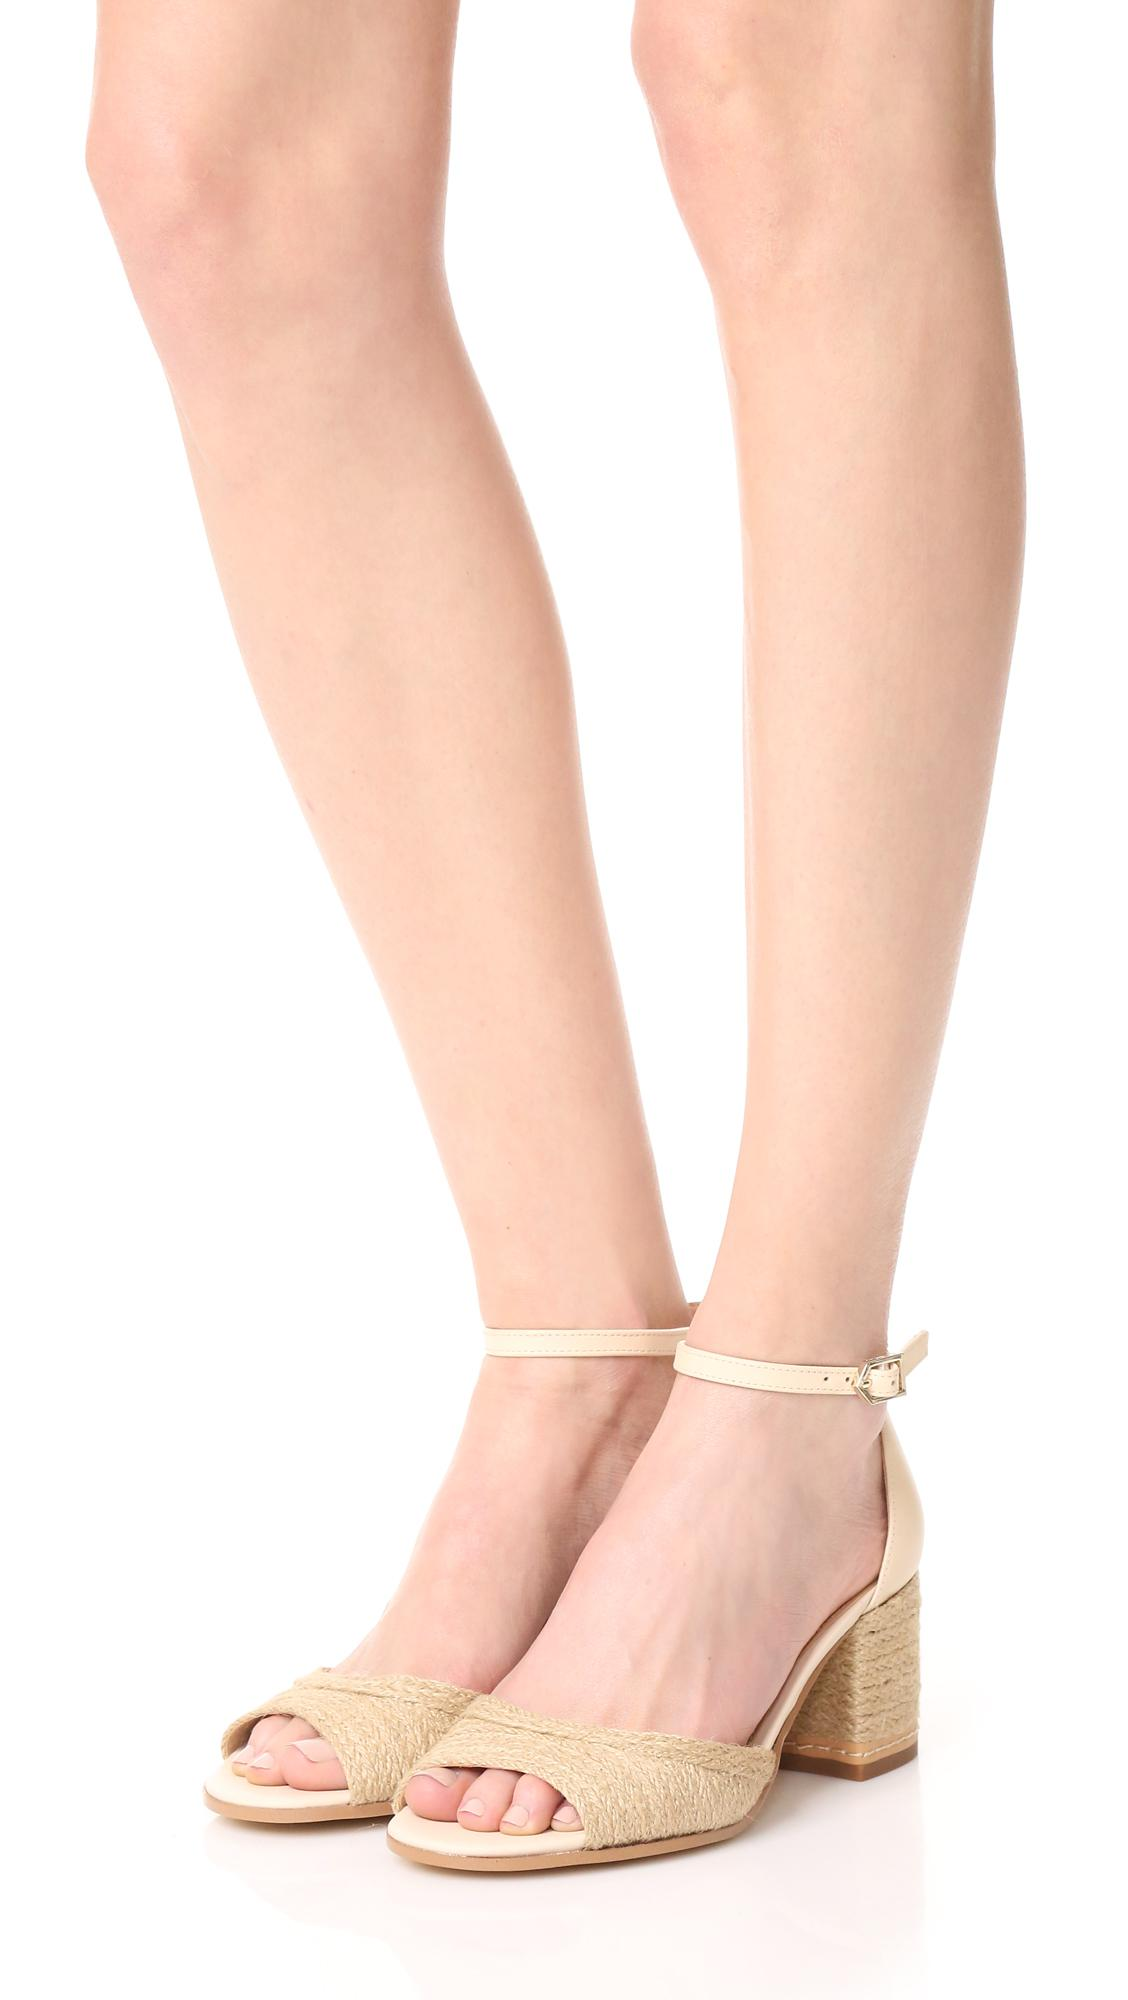 d0fa73b9d38cd5 Lyst - Sam Edelman Susie Ii City Sandals in Natural